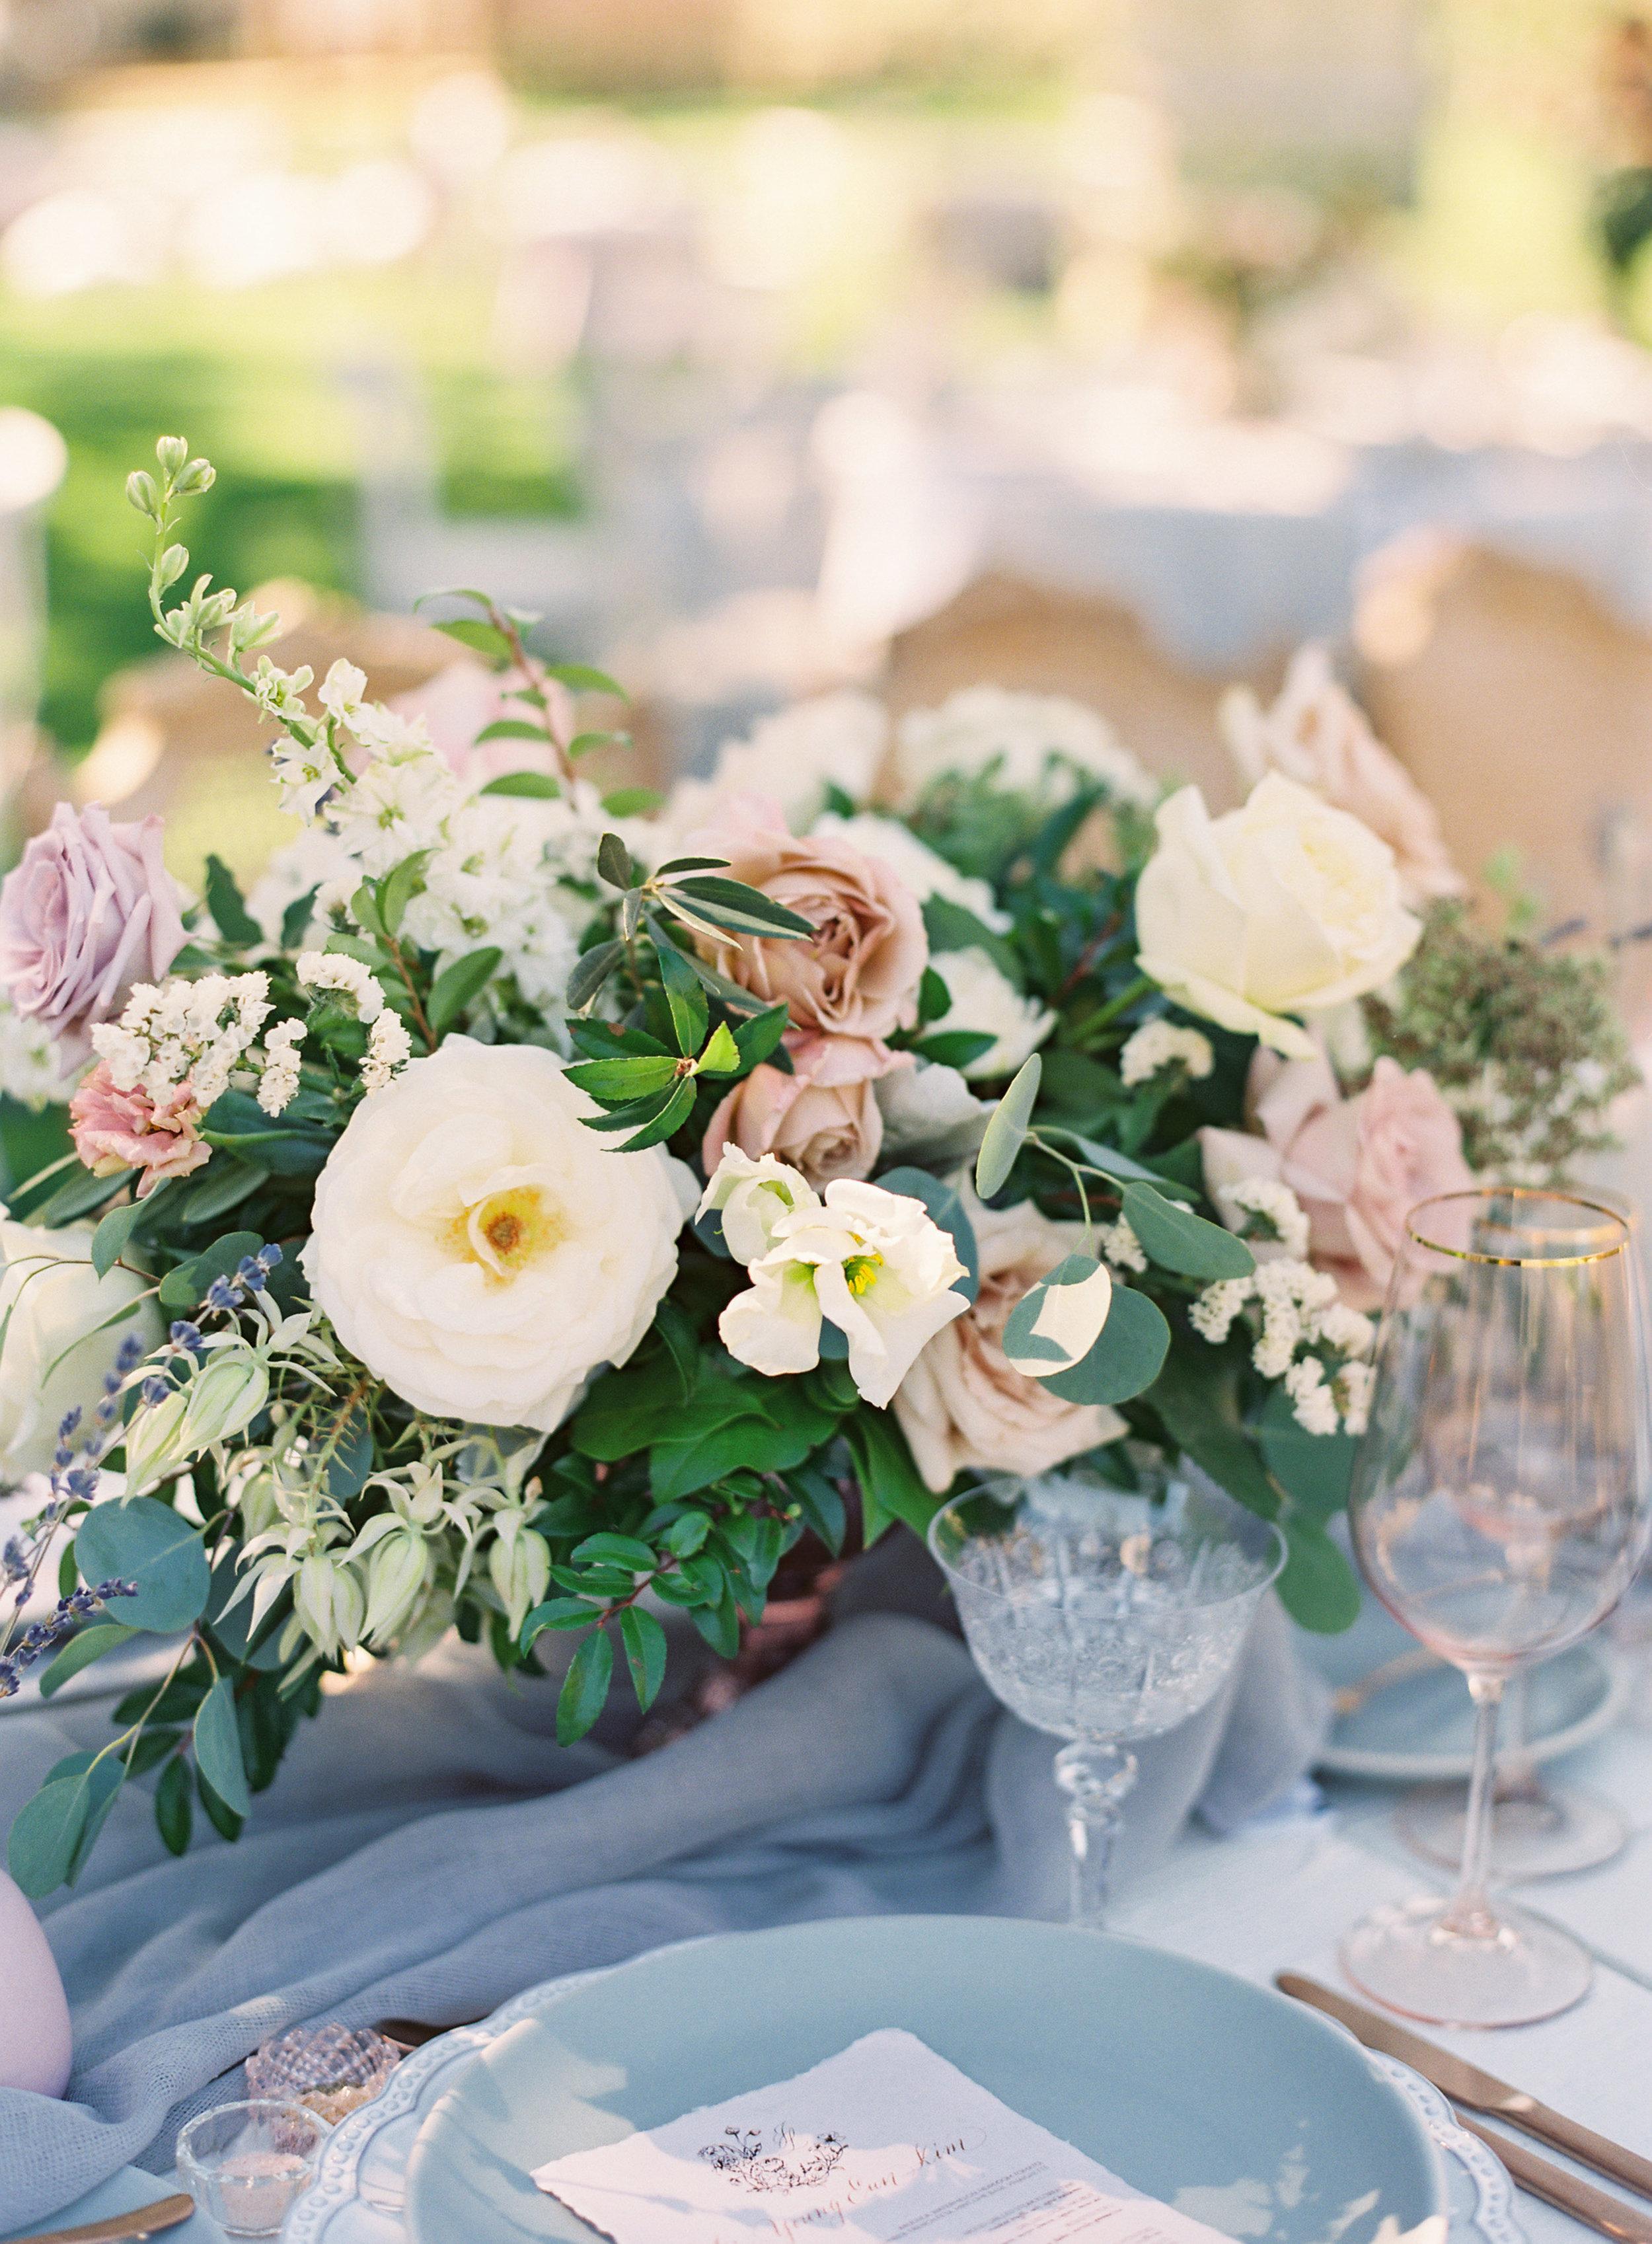 Triunfo_Creek_Winery_Wedding-183-Jen-Huang-JL-315-Jen-Huang-009964-R1-002.jpg